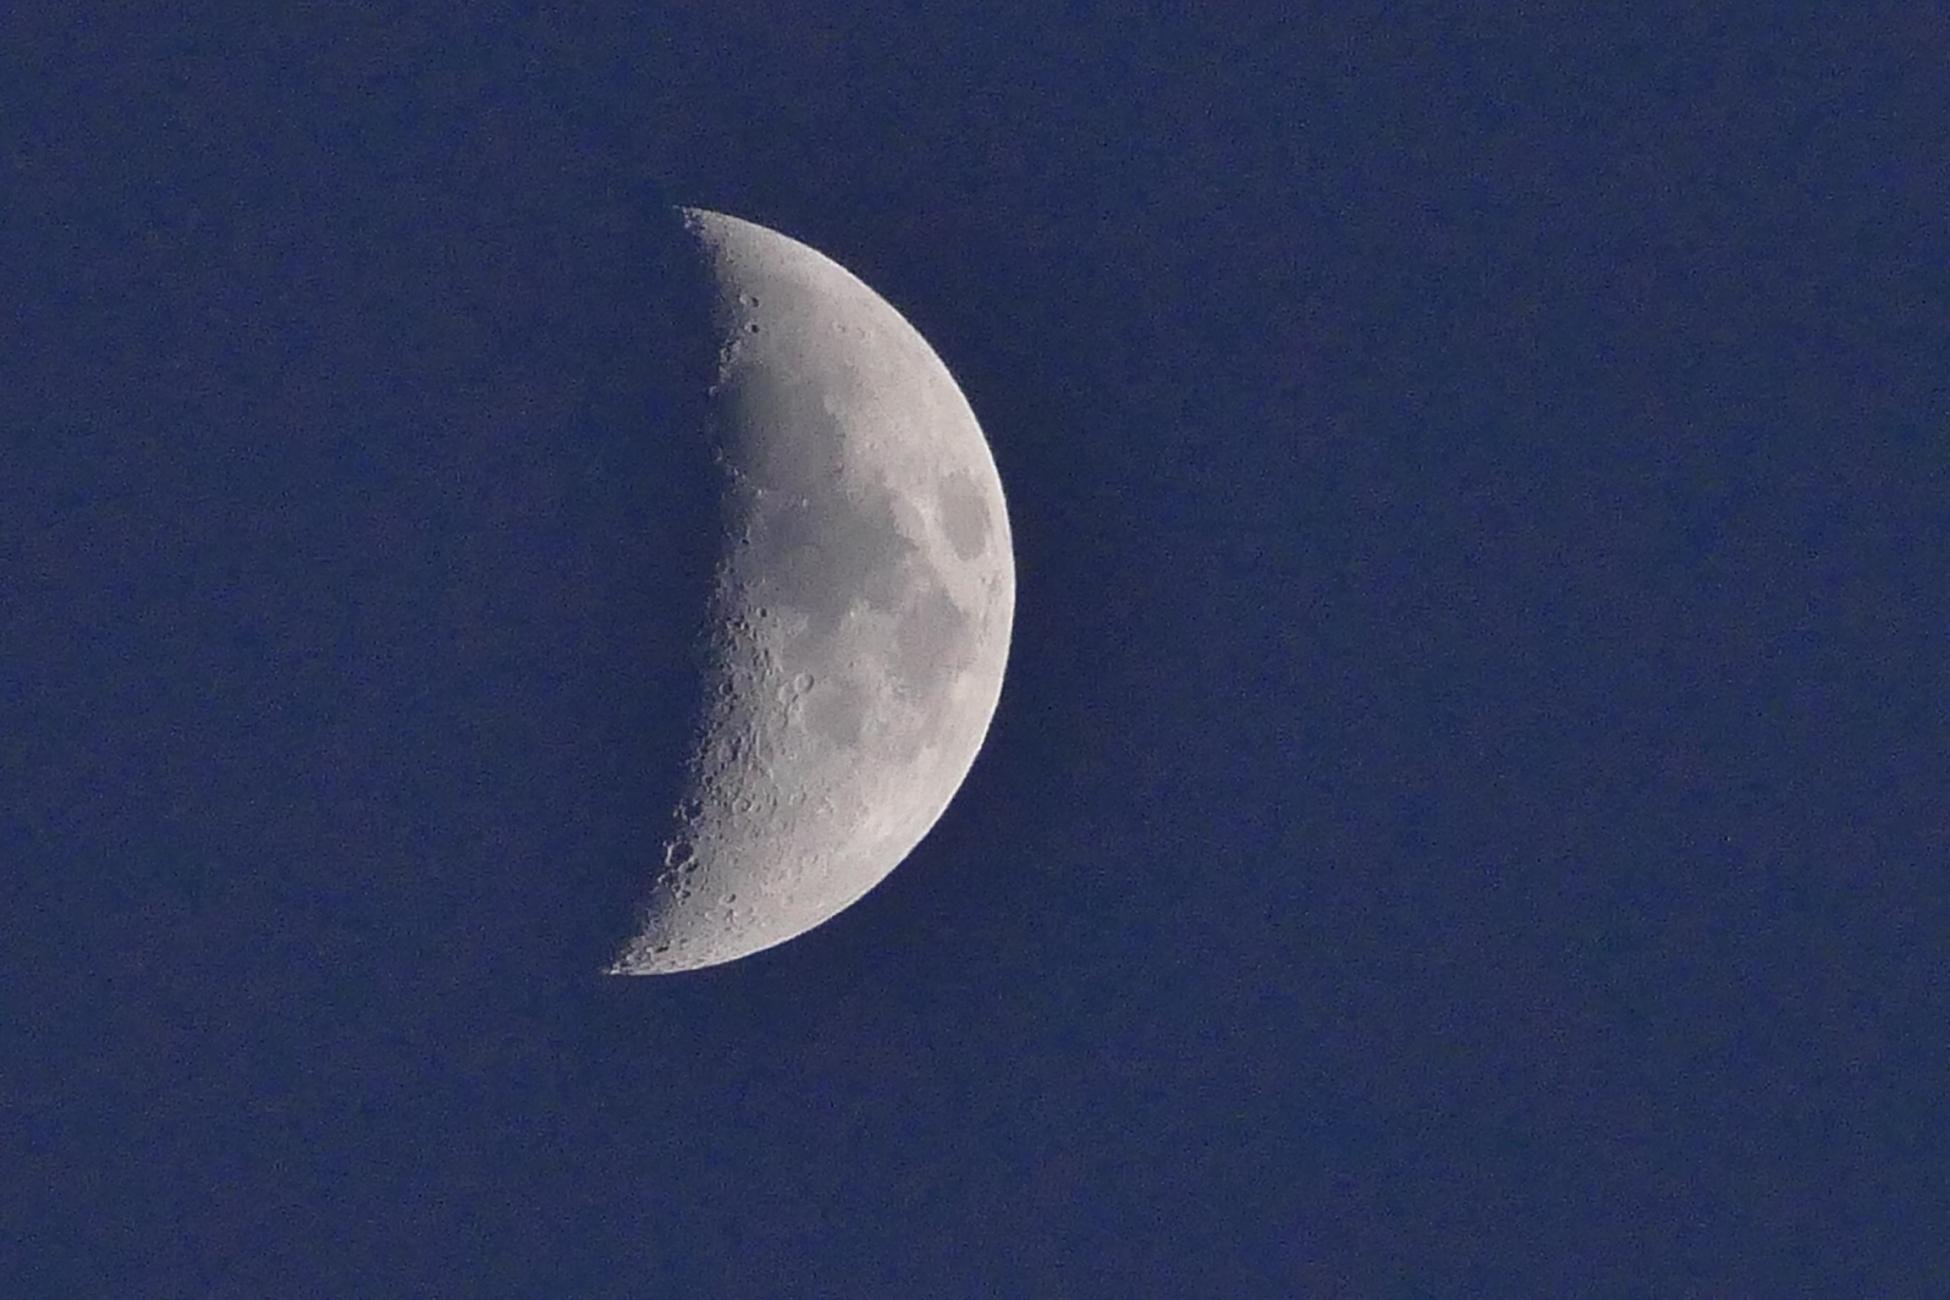 Half a moon